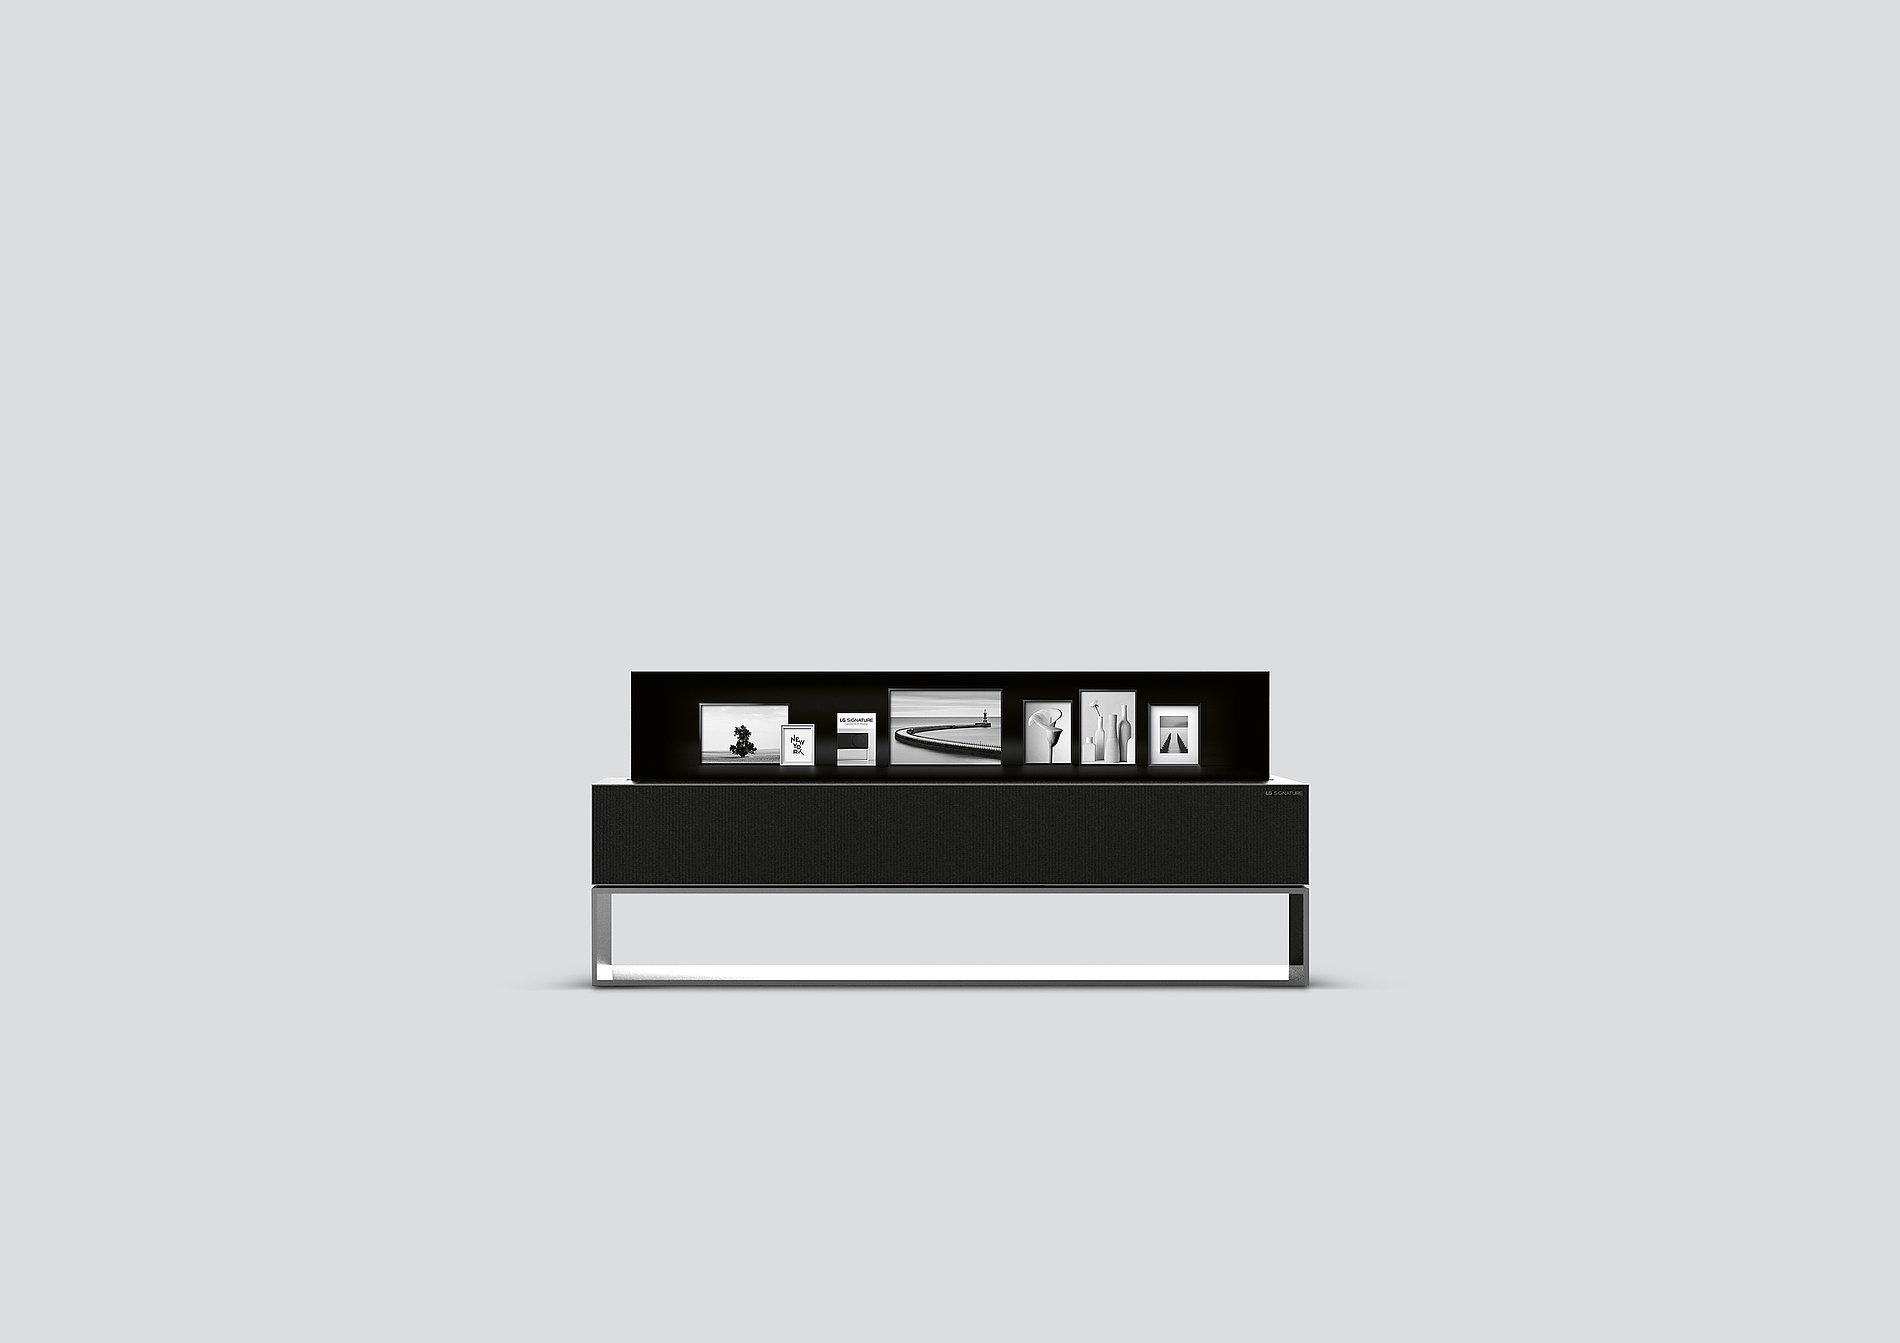 LG SIGNATURE OLED TV R | Red Dot Design Award